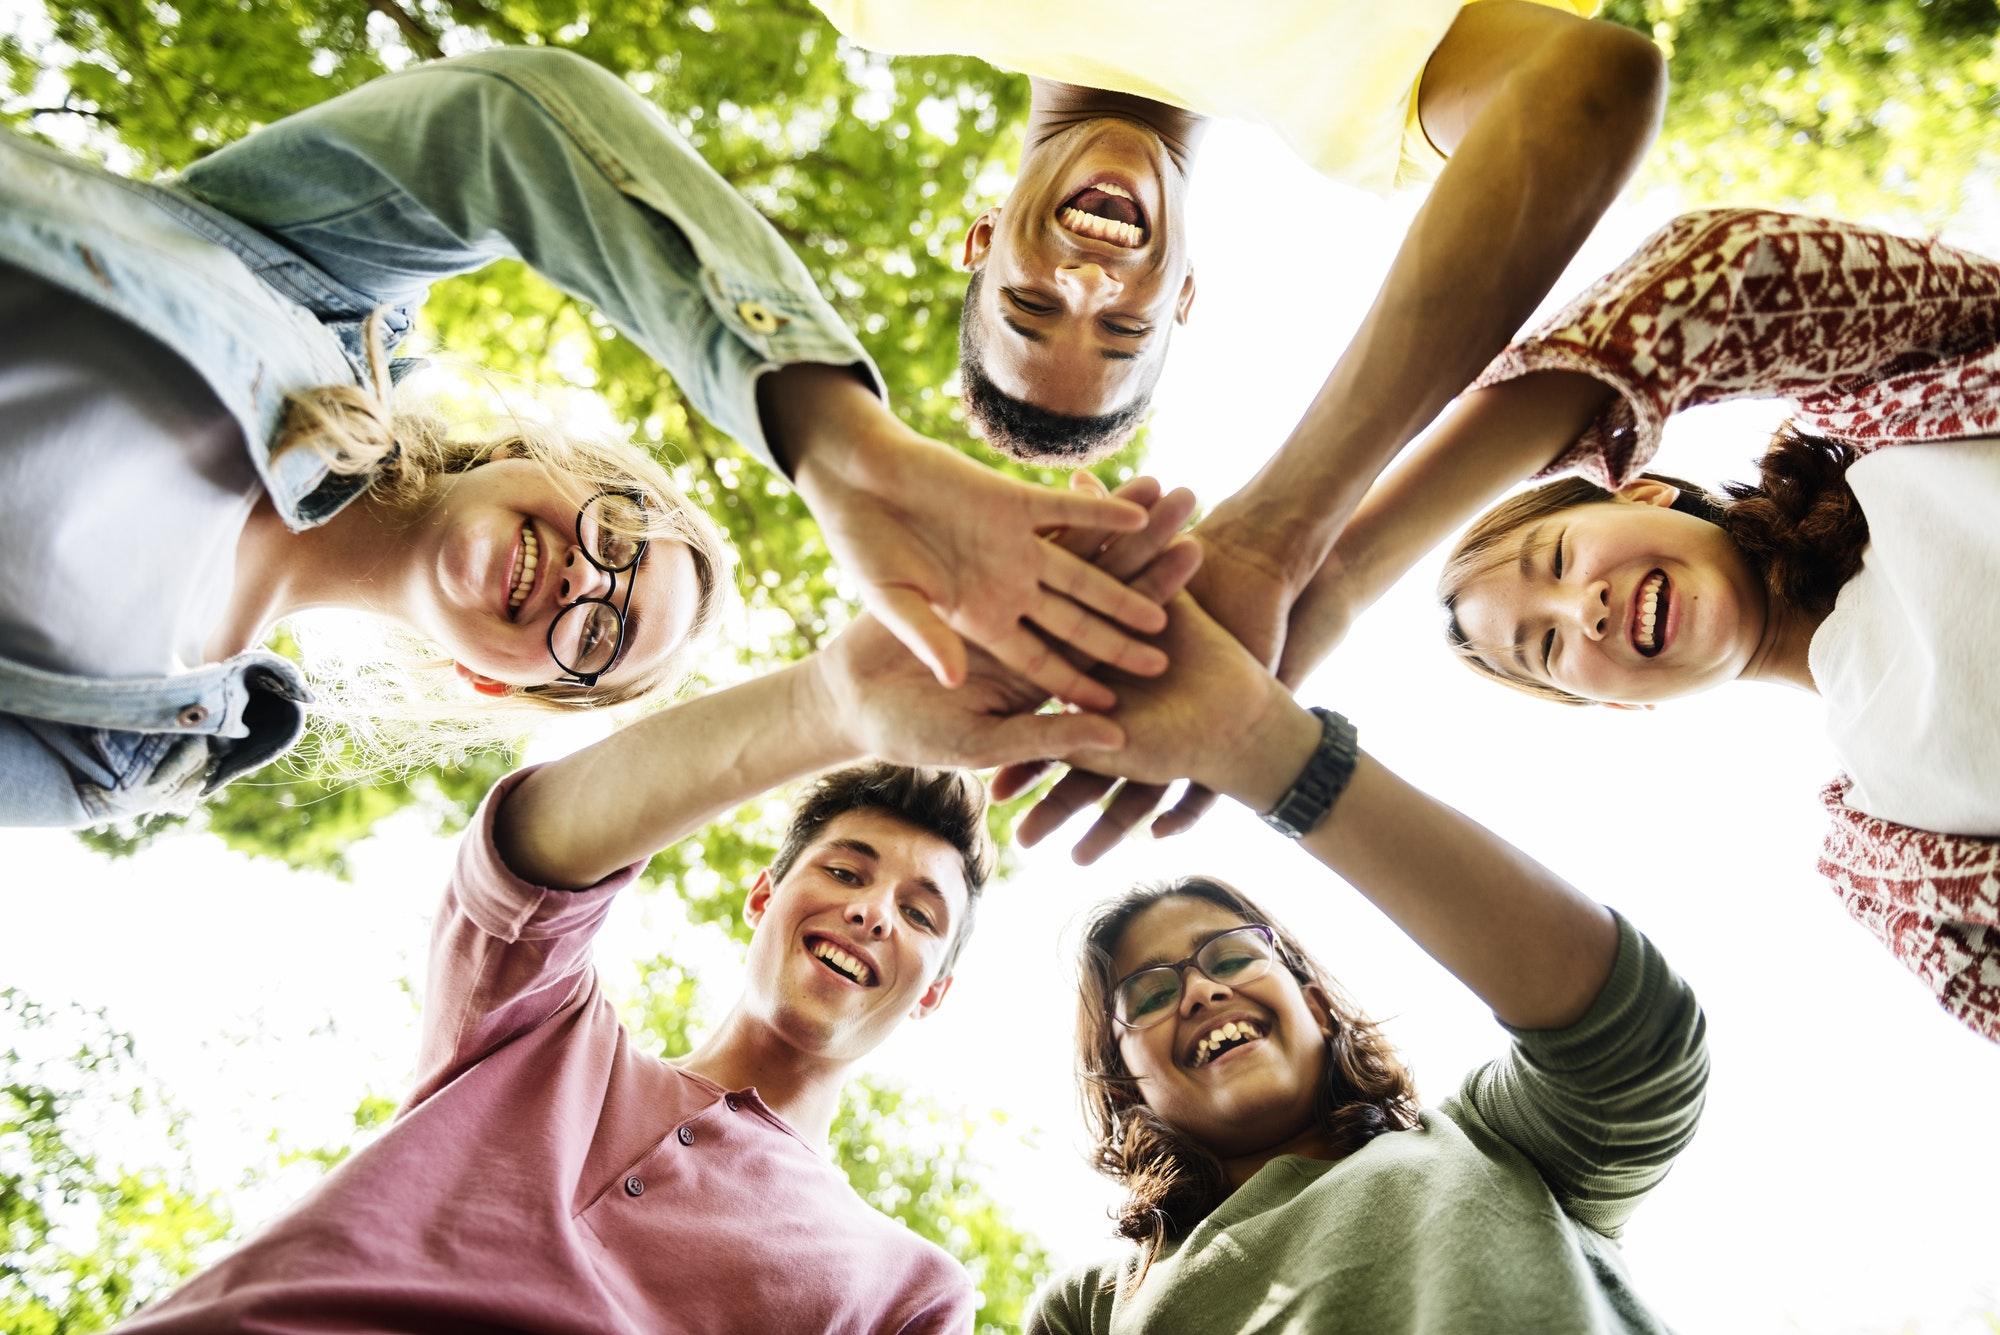 Diverse Teens Hands Together Concept